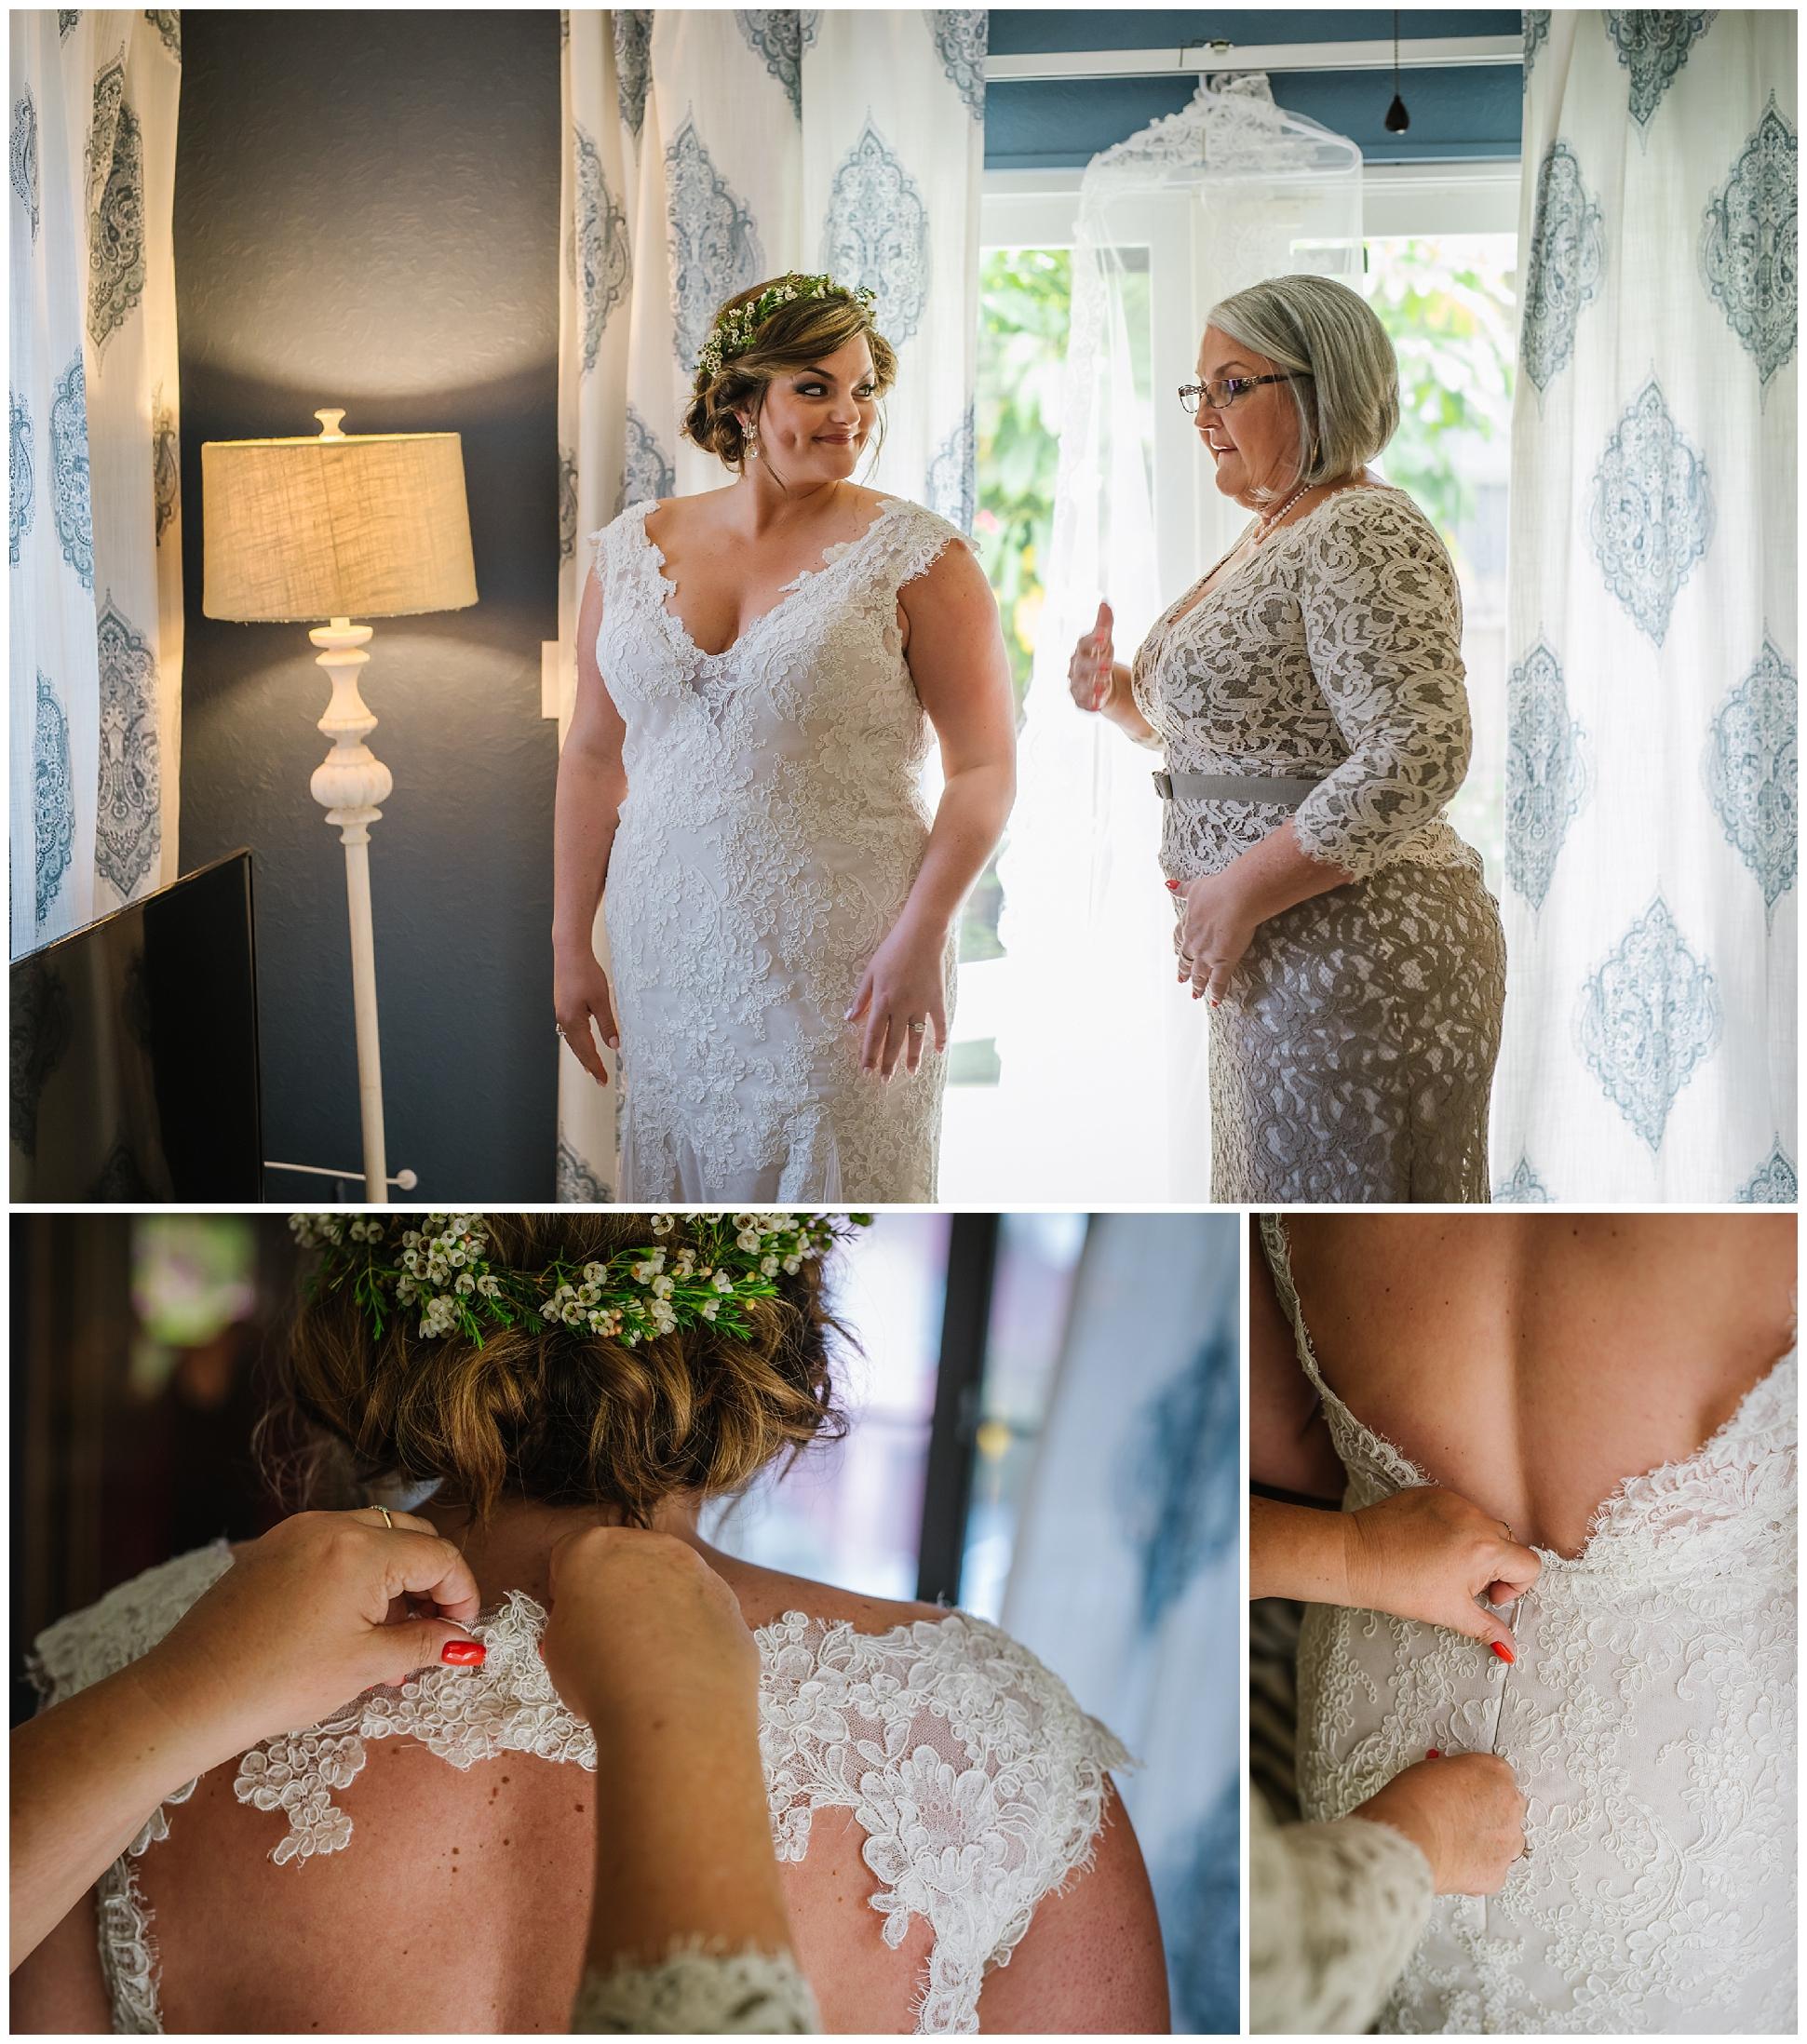 st-pete-wedding-photographer-italian-romance-theme-rustic-flower-crown_0380.jpg